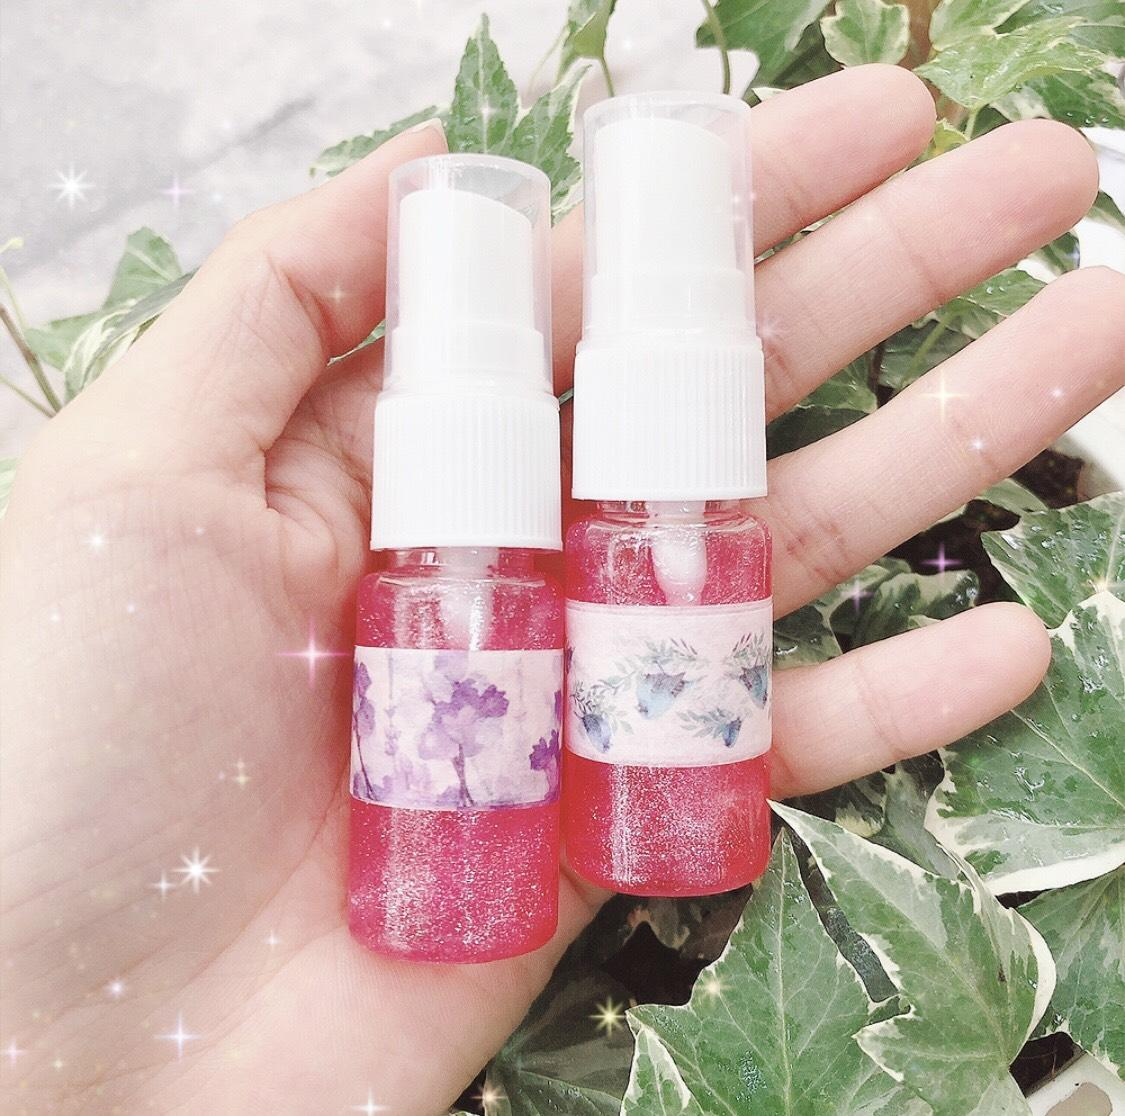 [Trial 10mL] Xịt thơm toàn thân Bath & Body Works / Victorias Secret Mist